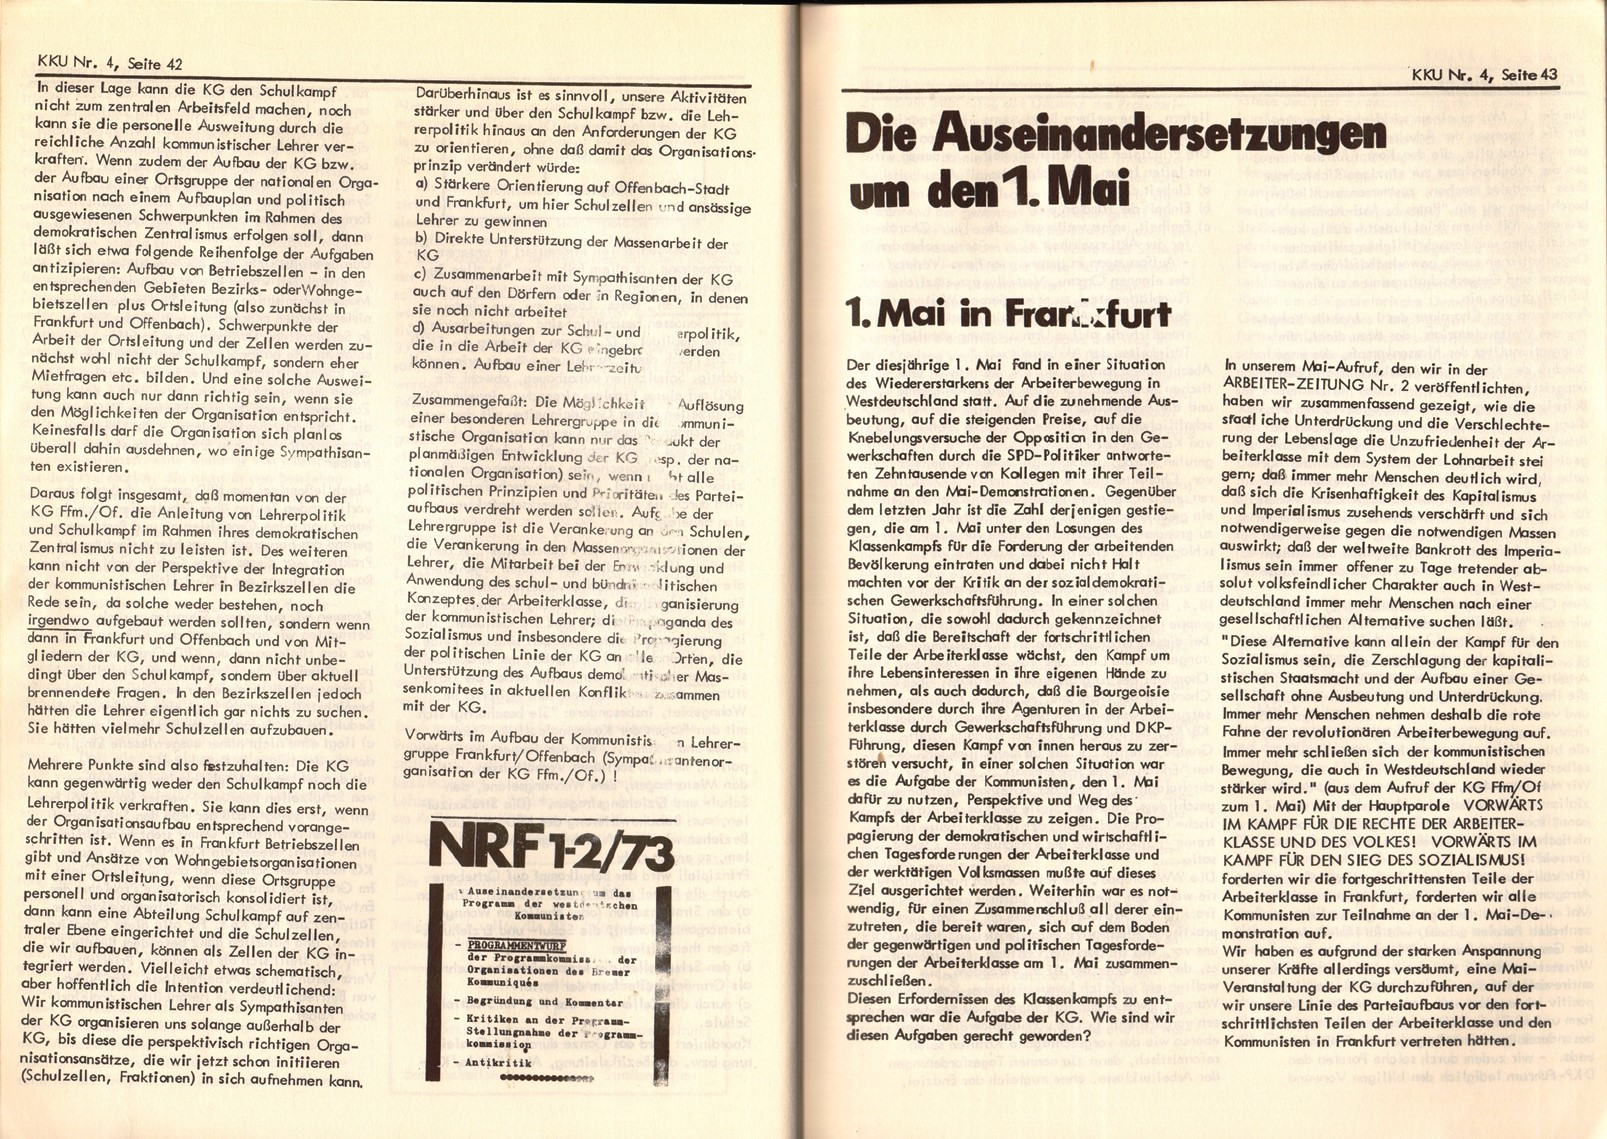 Frankfurt_Offenbach_KG_Kampf_Kritik_Umgestaltung_1973_04_05_22